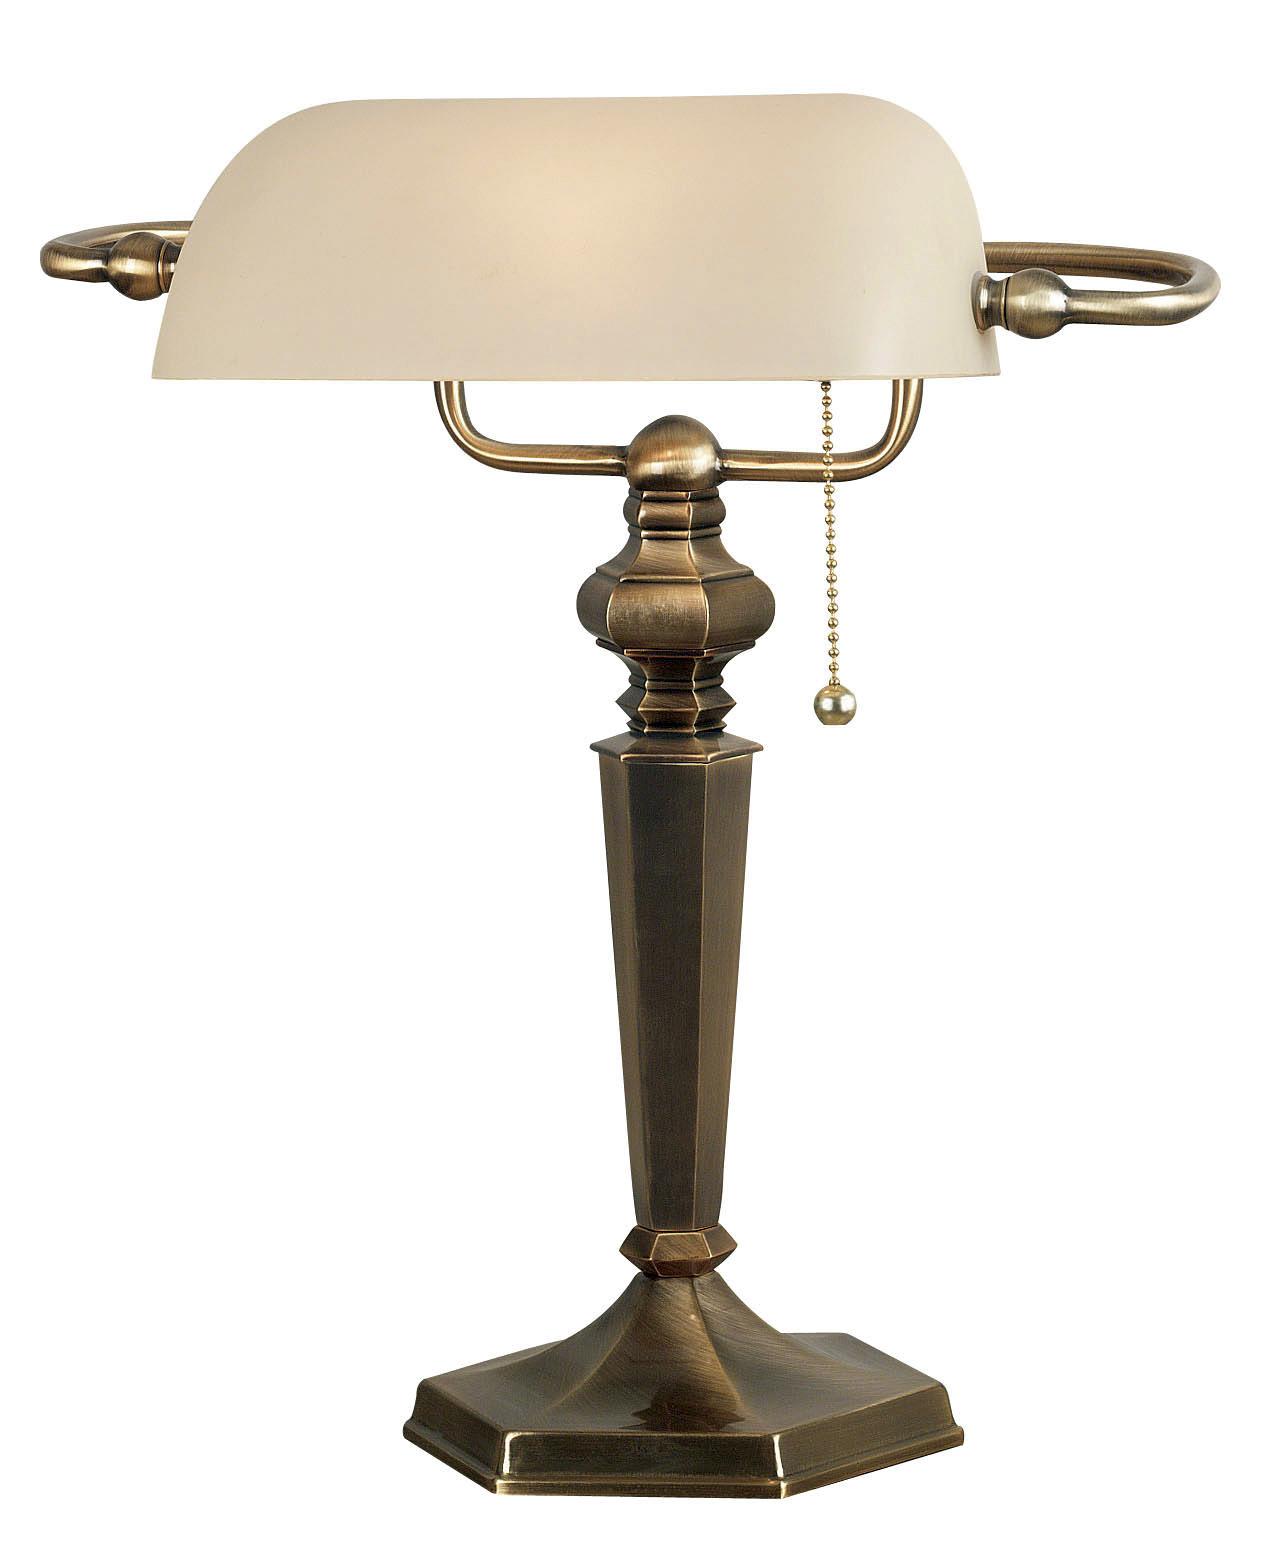 Kenroy home 20615gbrz mackinley desk lamp - Kenay home lamparas ...